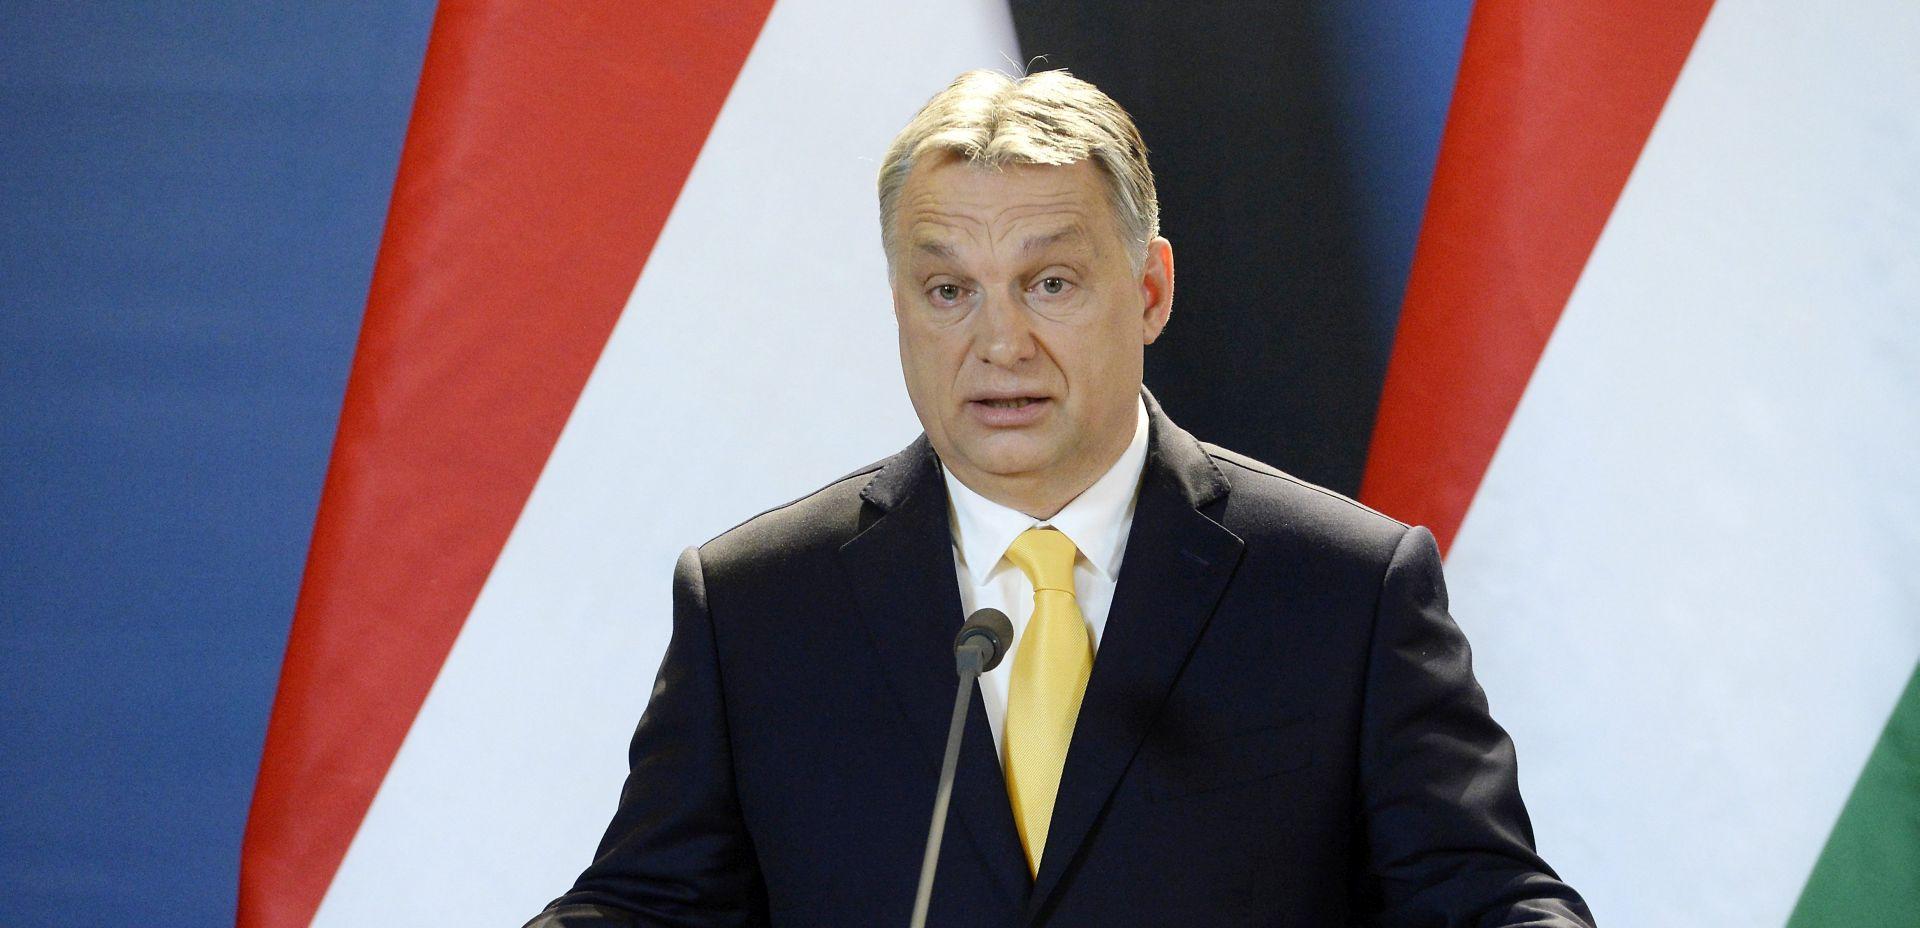 Janšin sastanak s Orbanom u Budimpešti prekinuo Trump